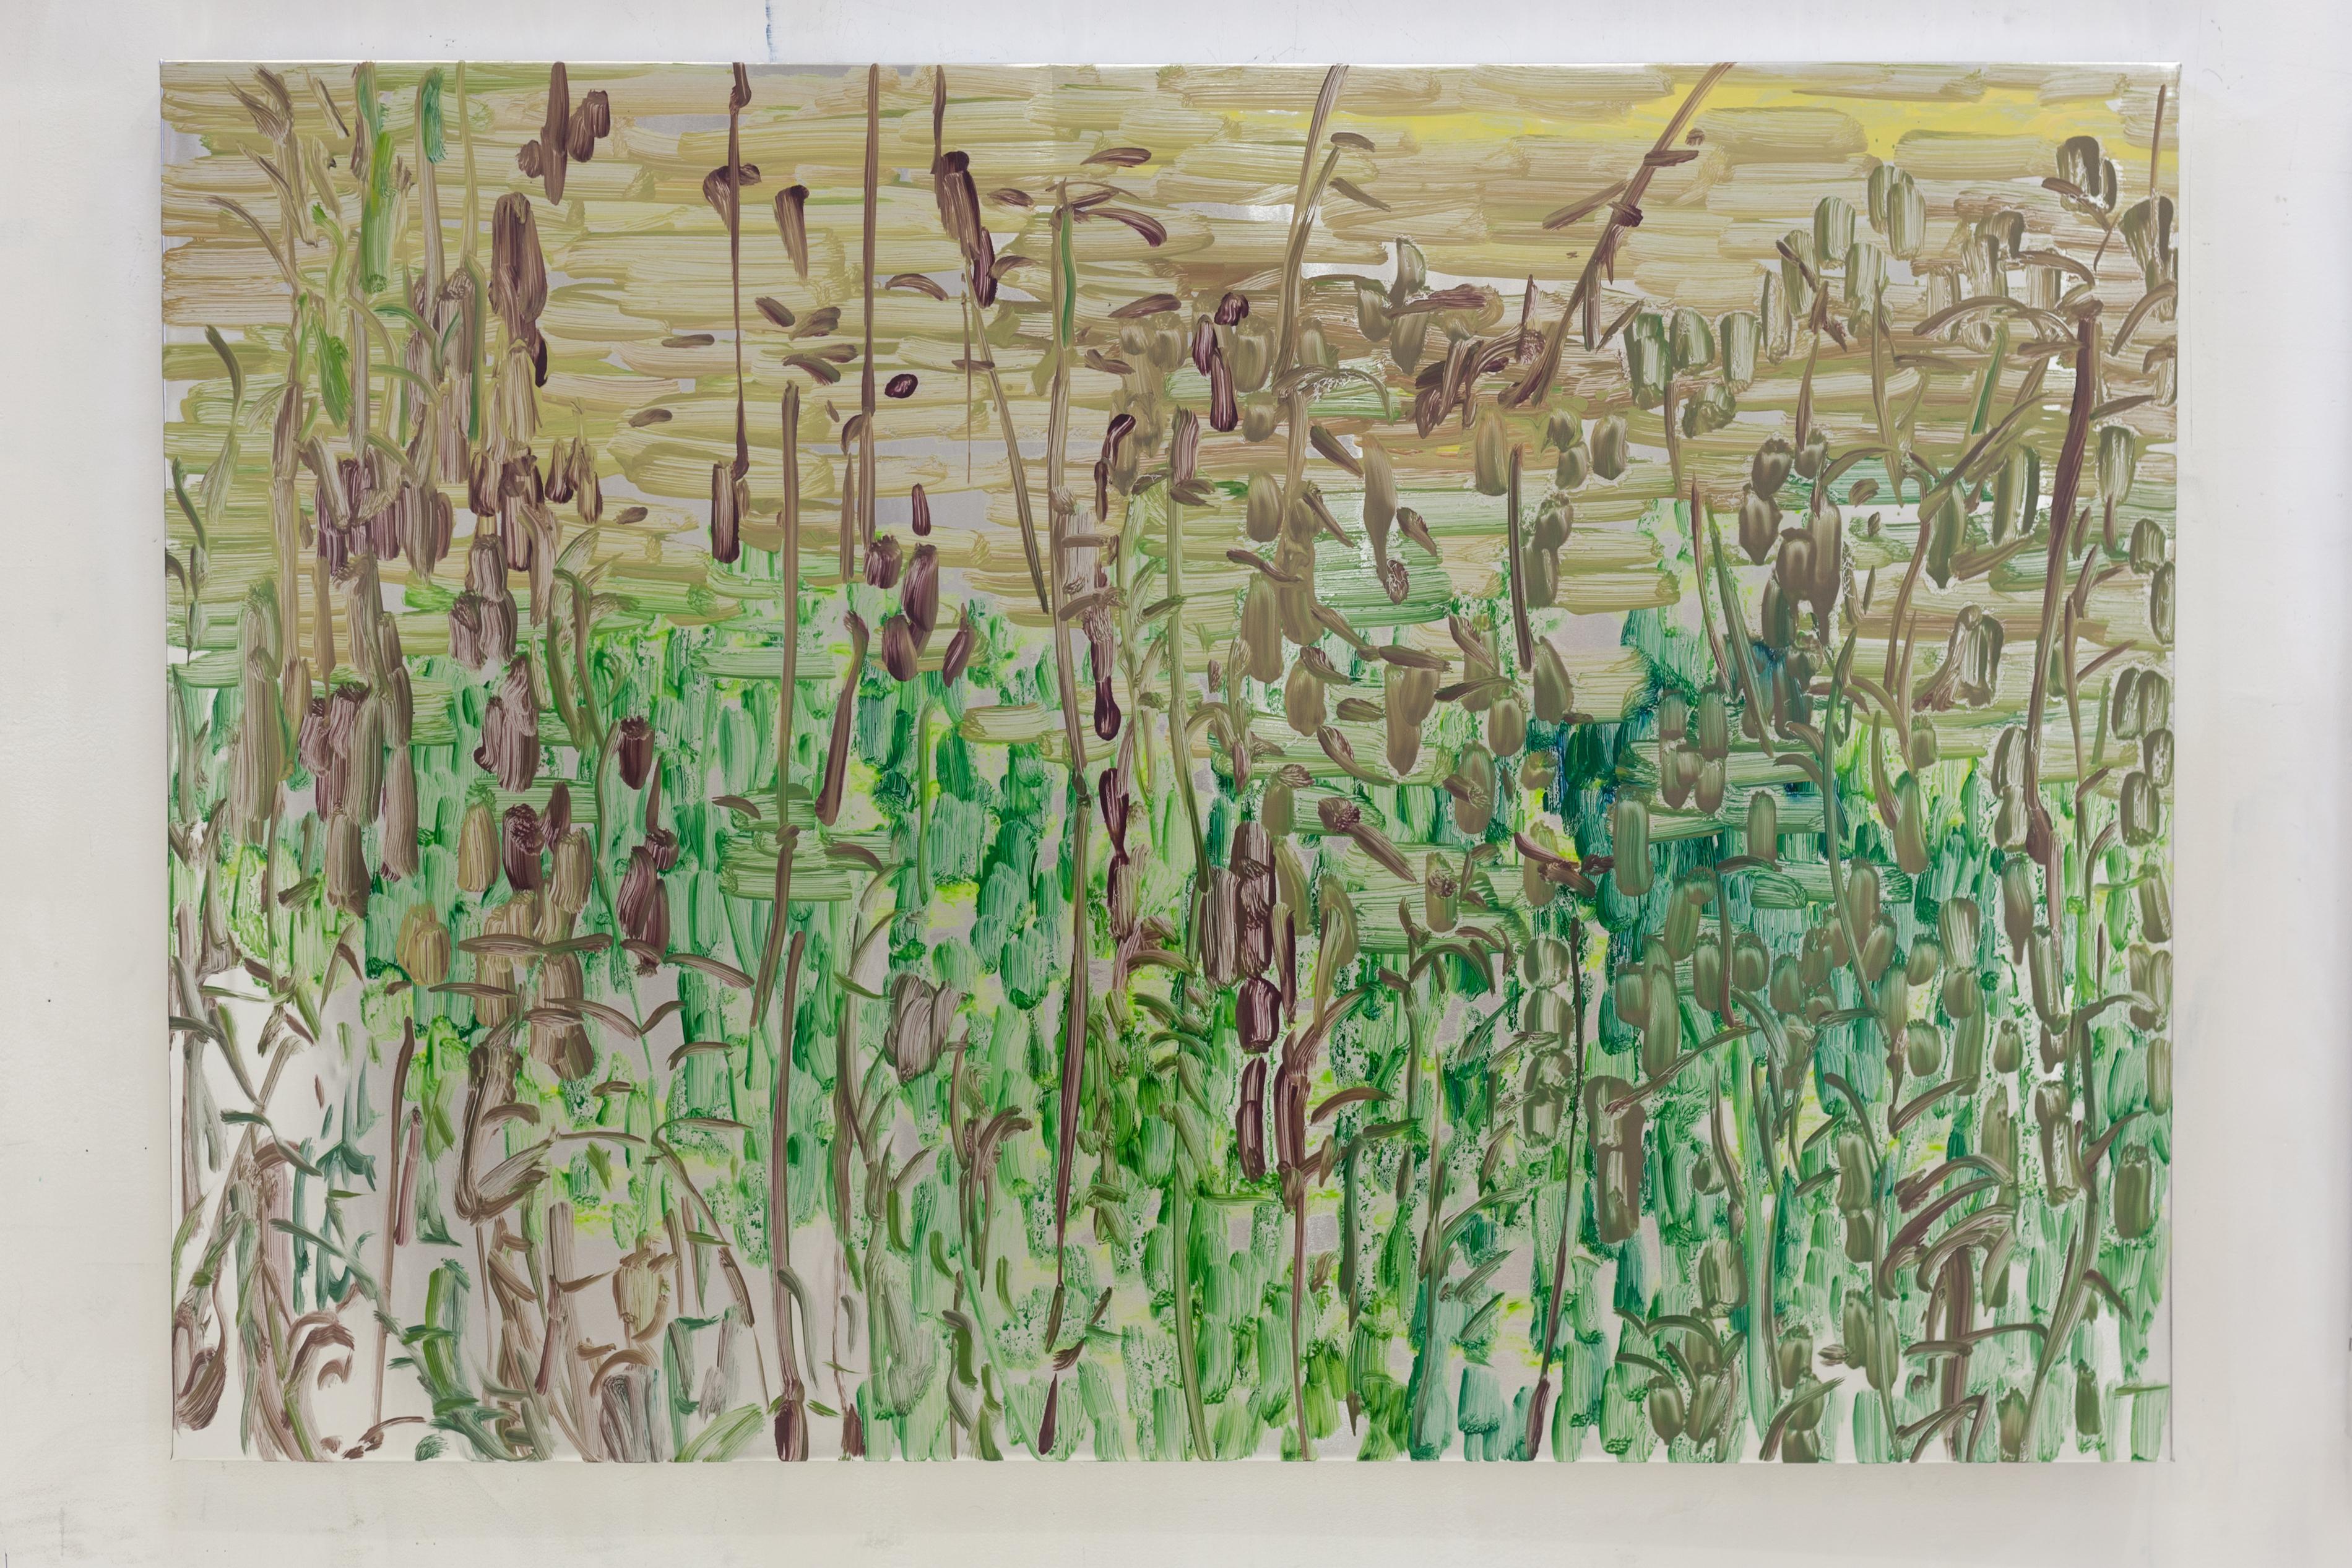 Henrik Eriksson, Utan titel (dhs 06), 2018 Oil on aluminium, 85 x 122 cm